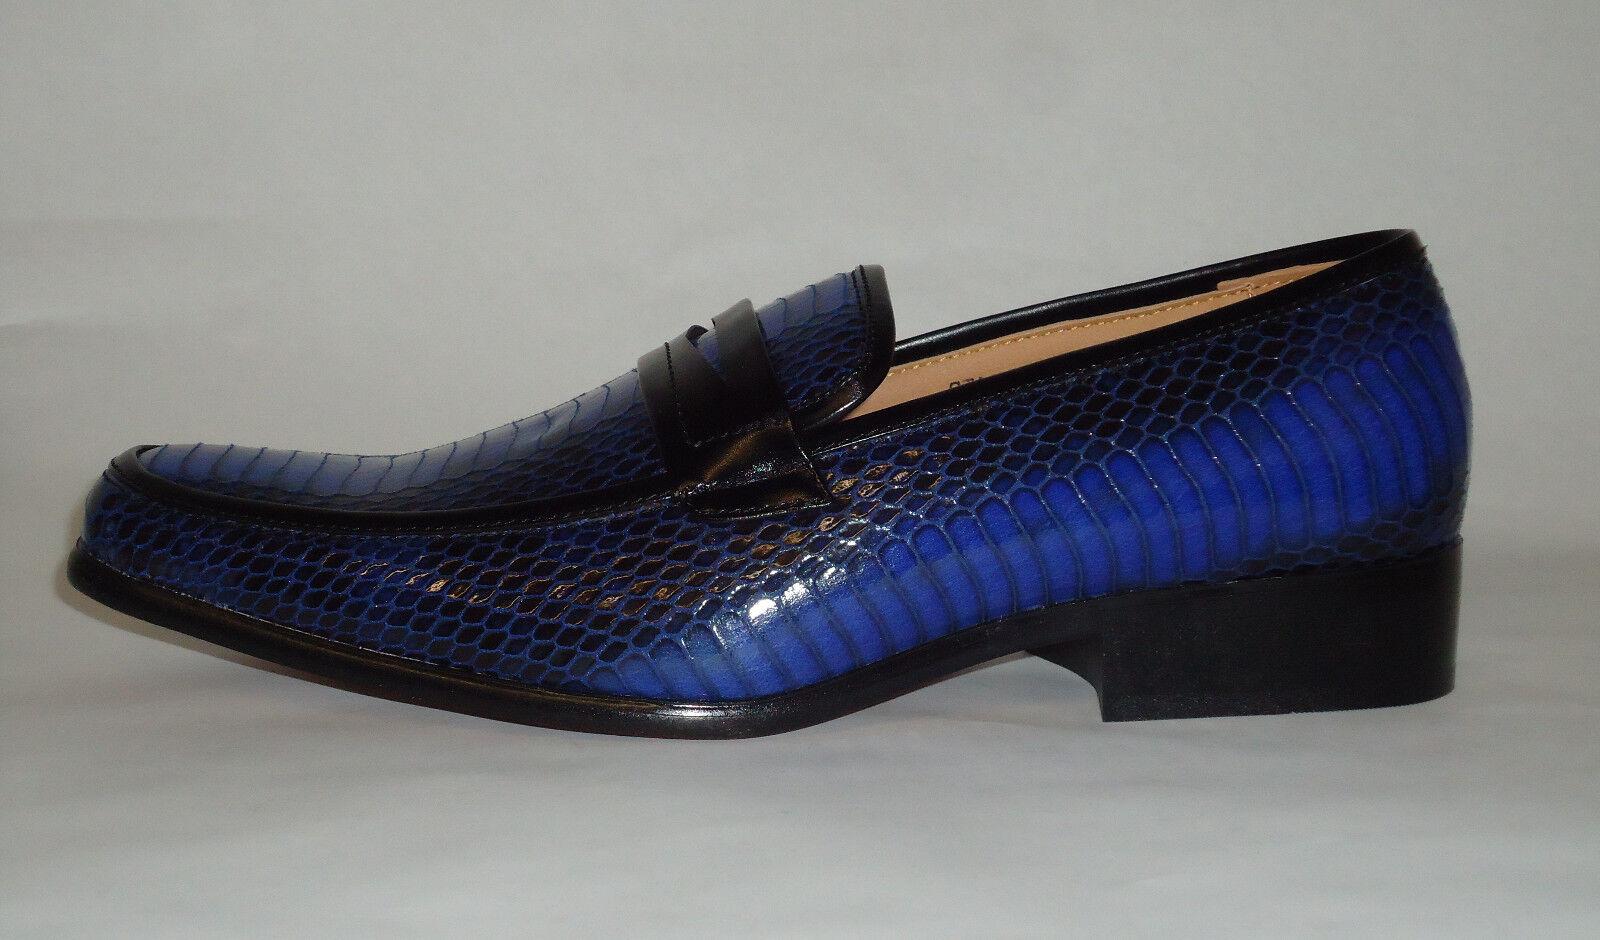 Antonio Cerrelli 6494 Mens Amazing Royal bluee Snake Embossed Dress Loafers shoes